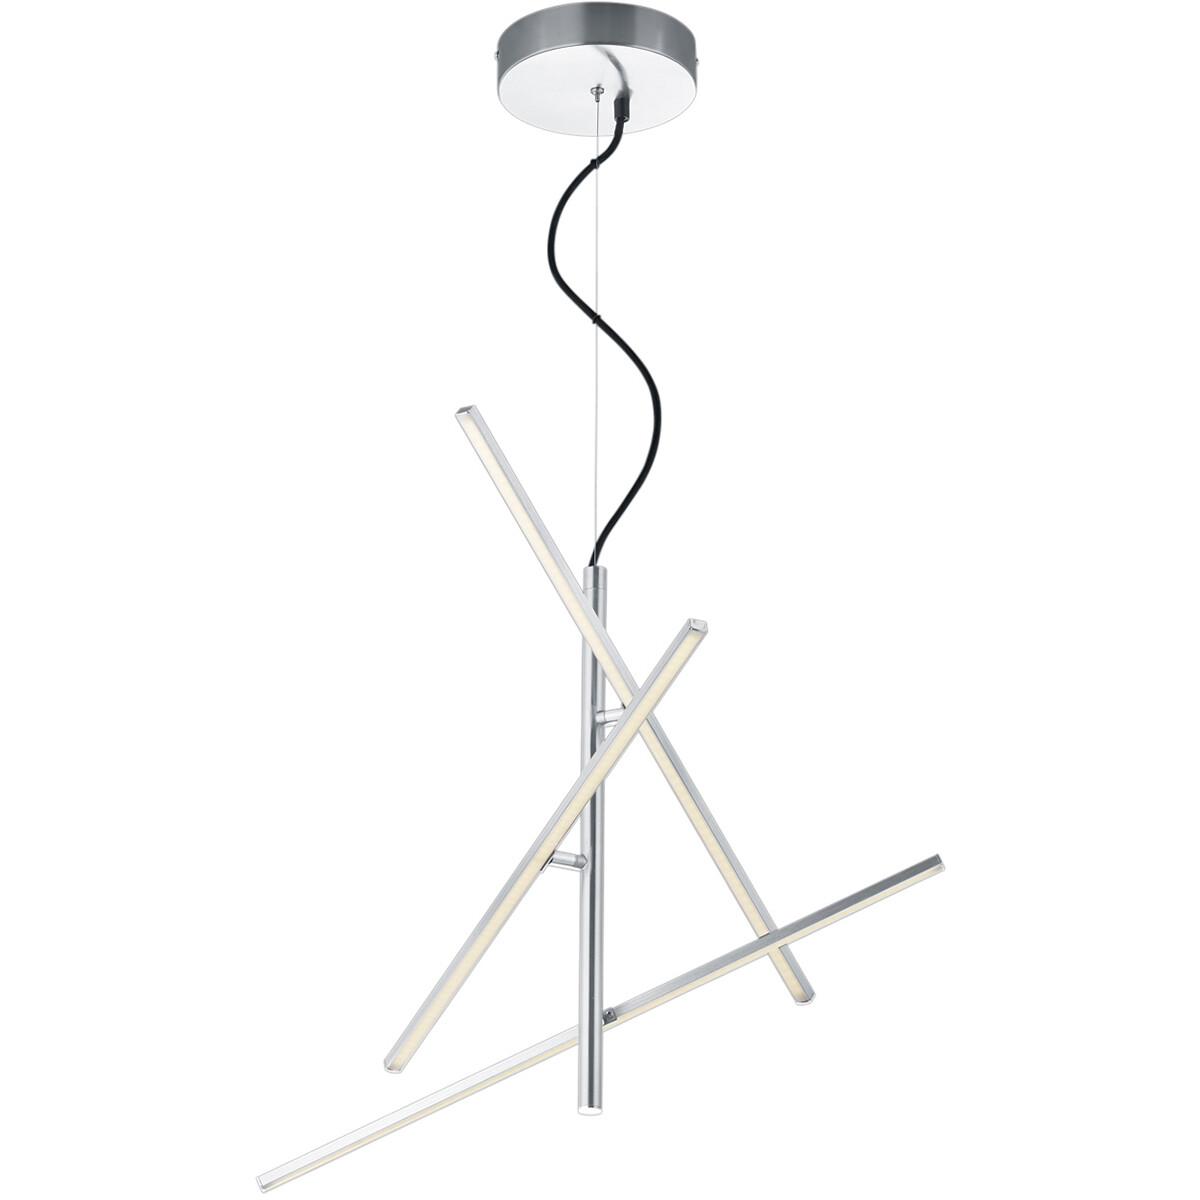 LED Hanglamp - Hangverlichting - Trion Tiraki - 21W - Warm Wit 3000K - Rechthoek - Mat Nikkel - Alum